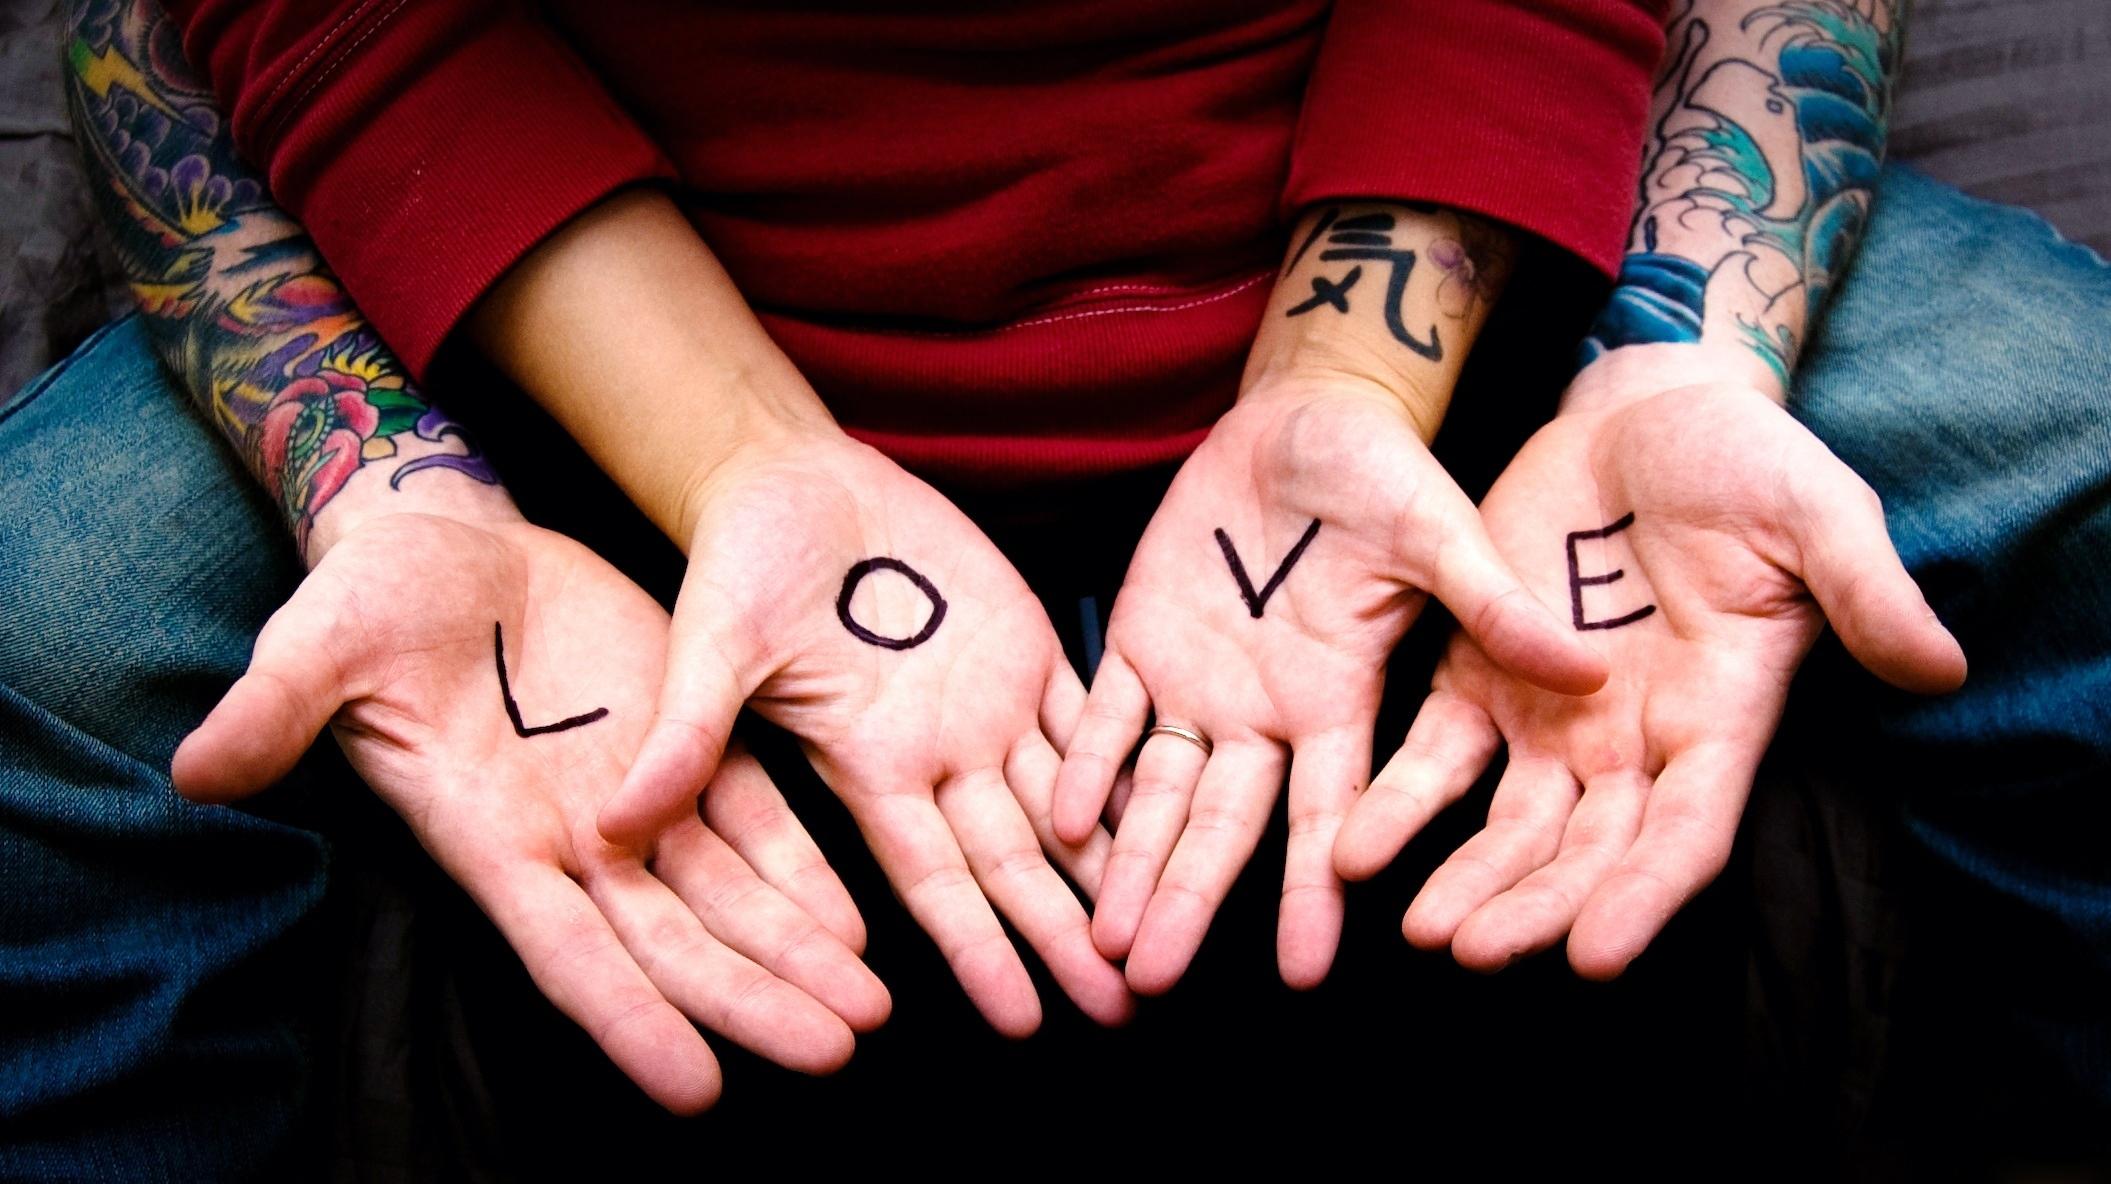 arms-couple-tattoo-heart-love-663890.jpg